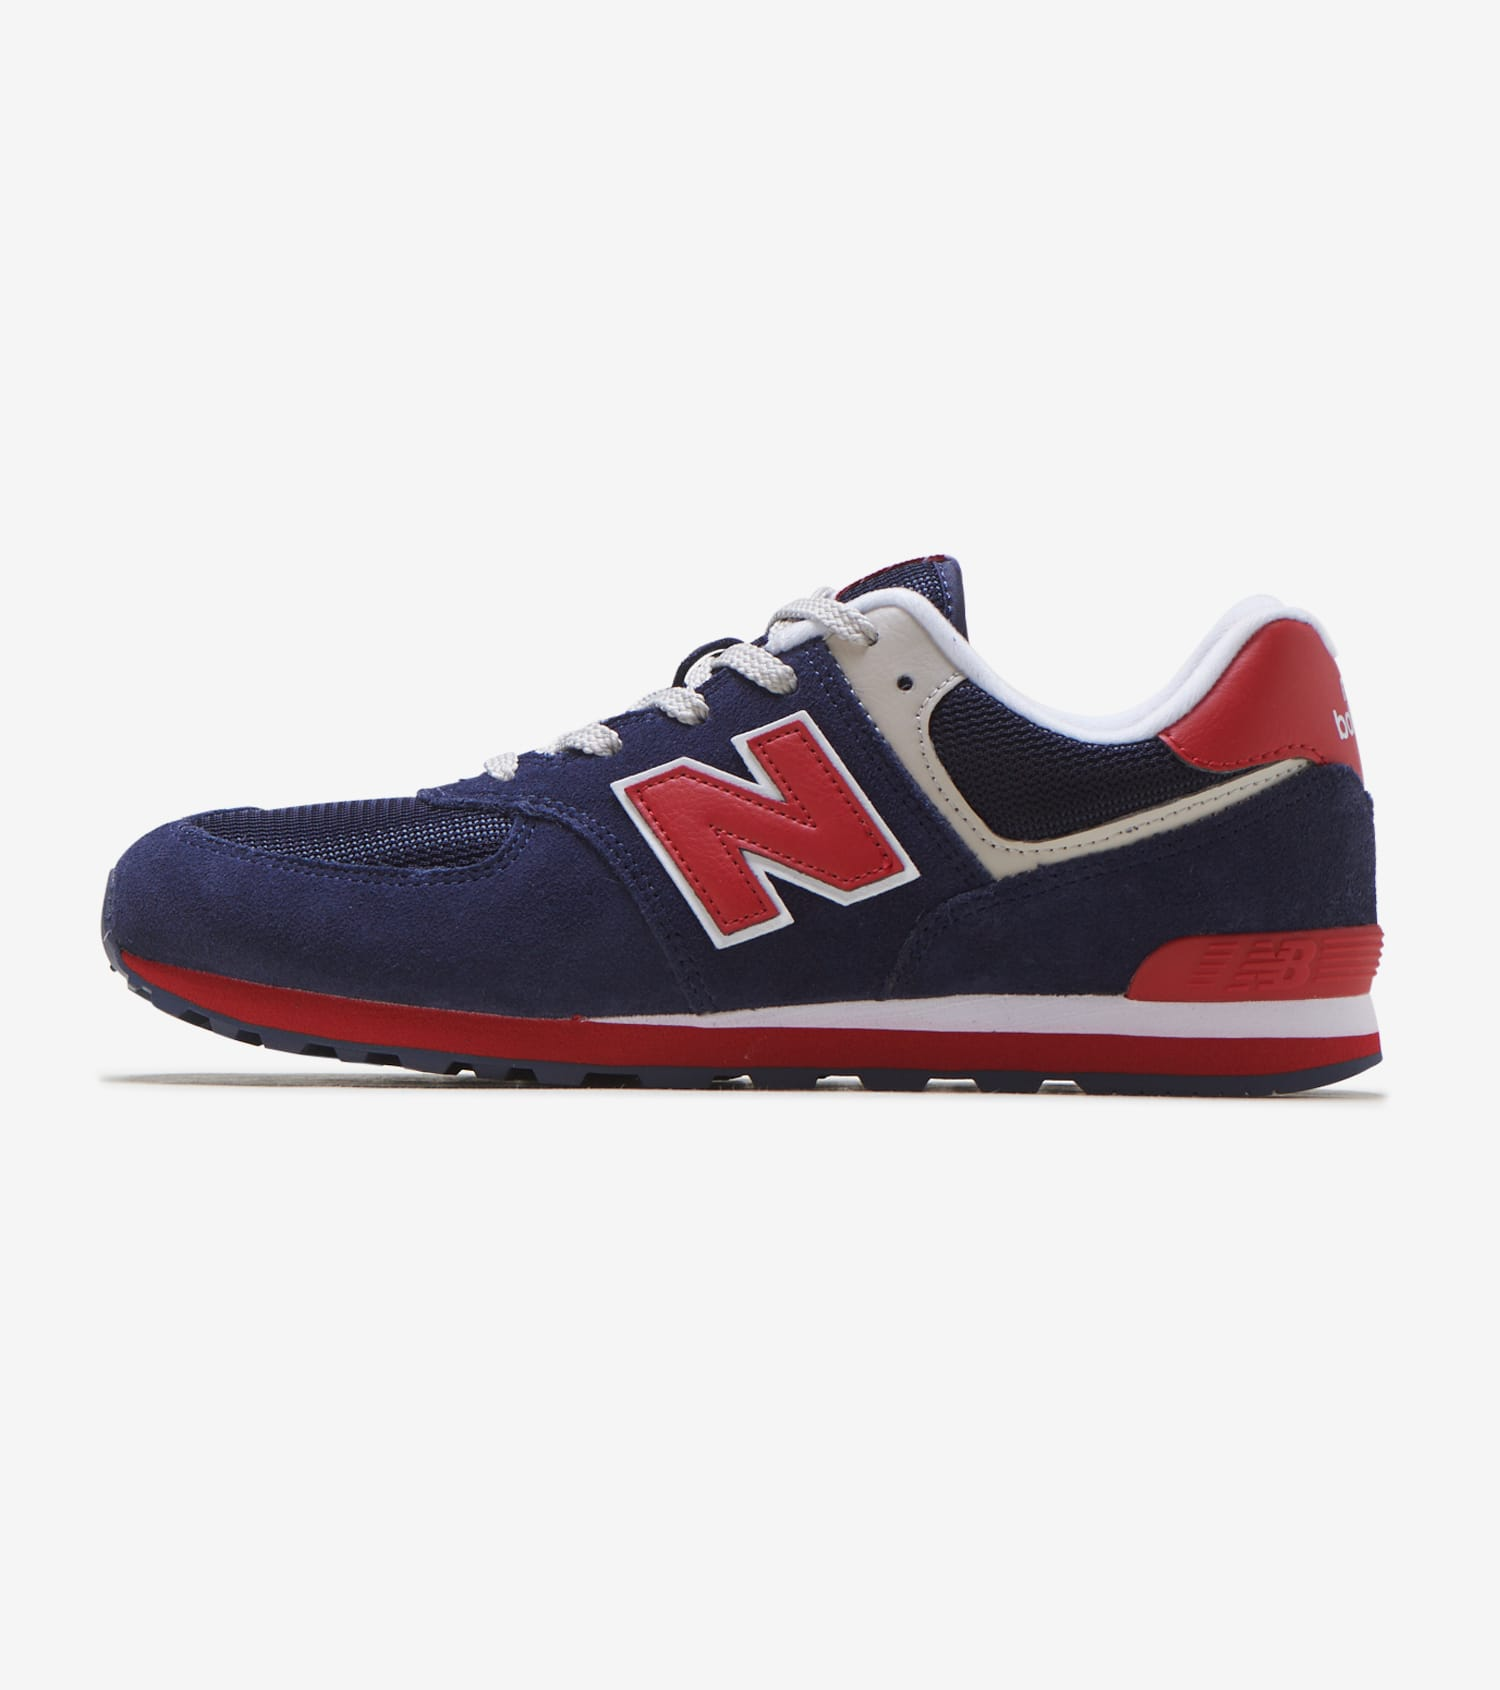 nuove new balance 574